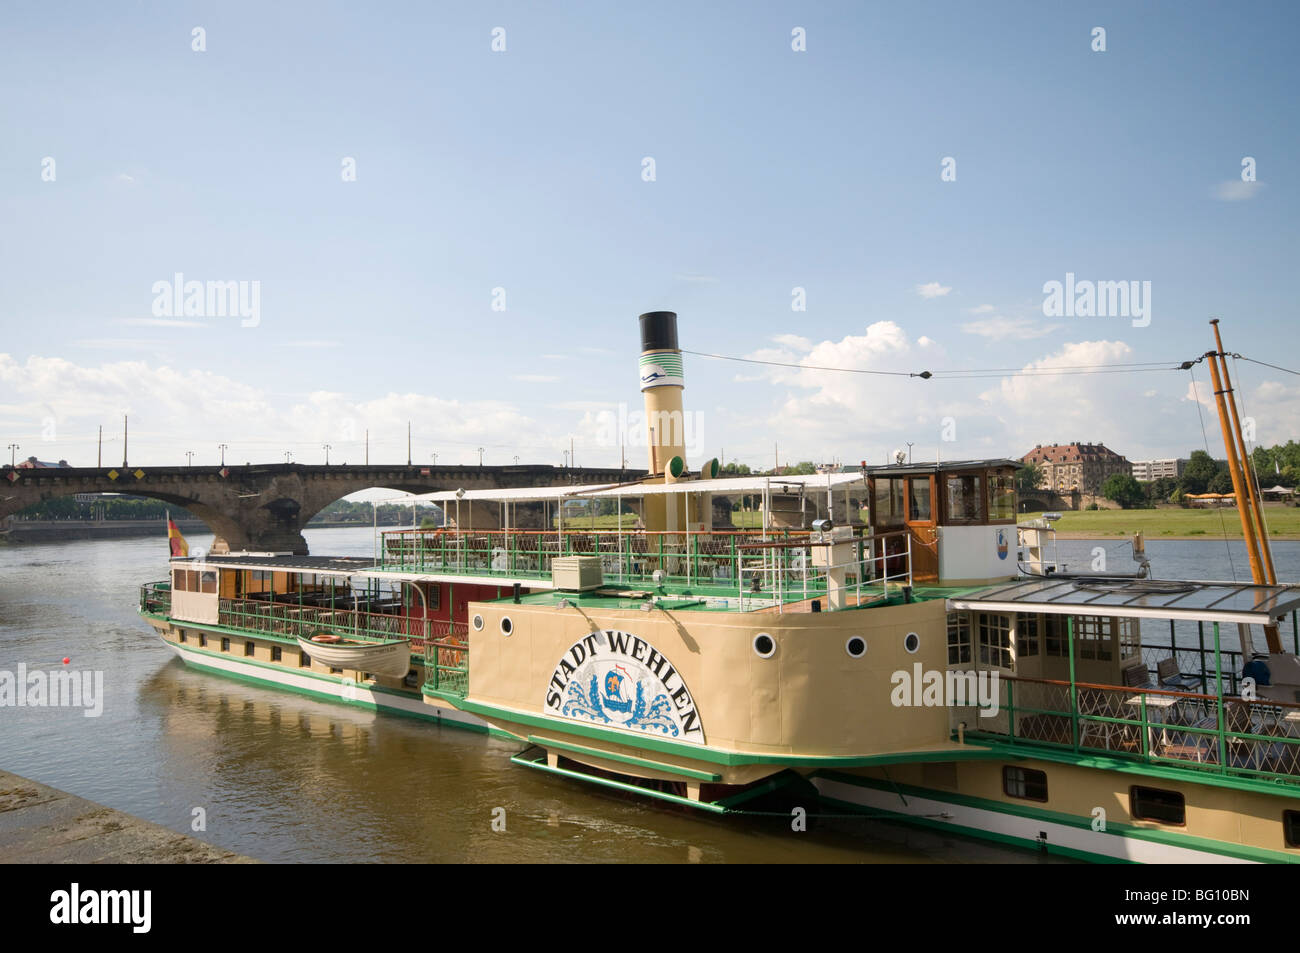 Paddel-Dampfer am Fluss Elbe, Dresden, Sachsen, Deutschland, Europa Stockbild